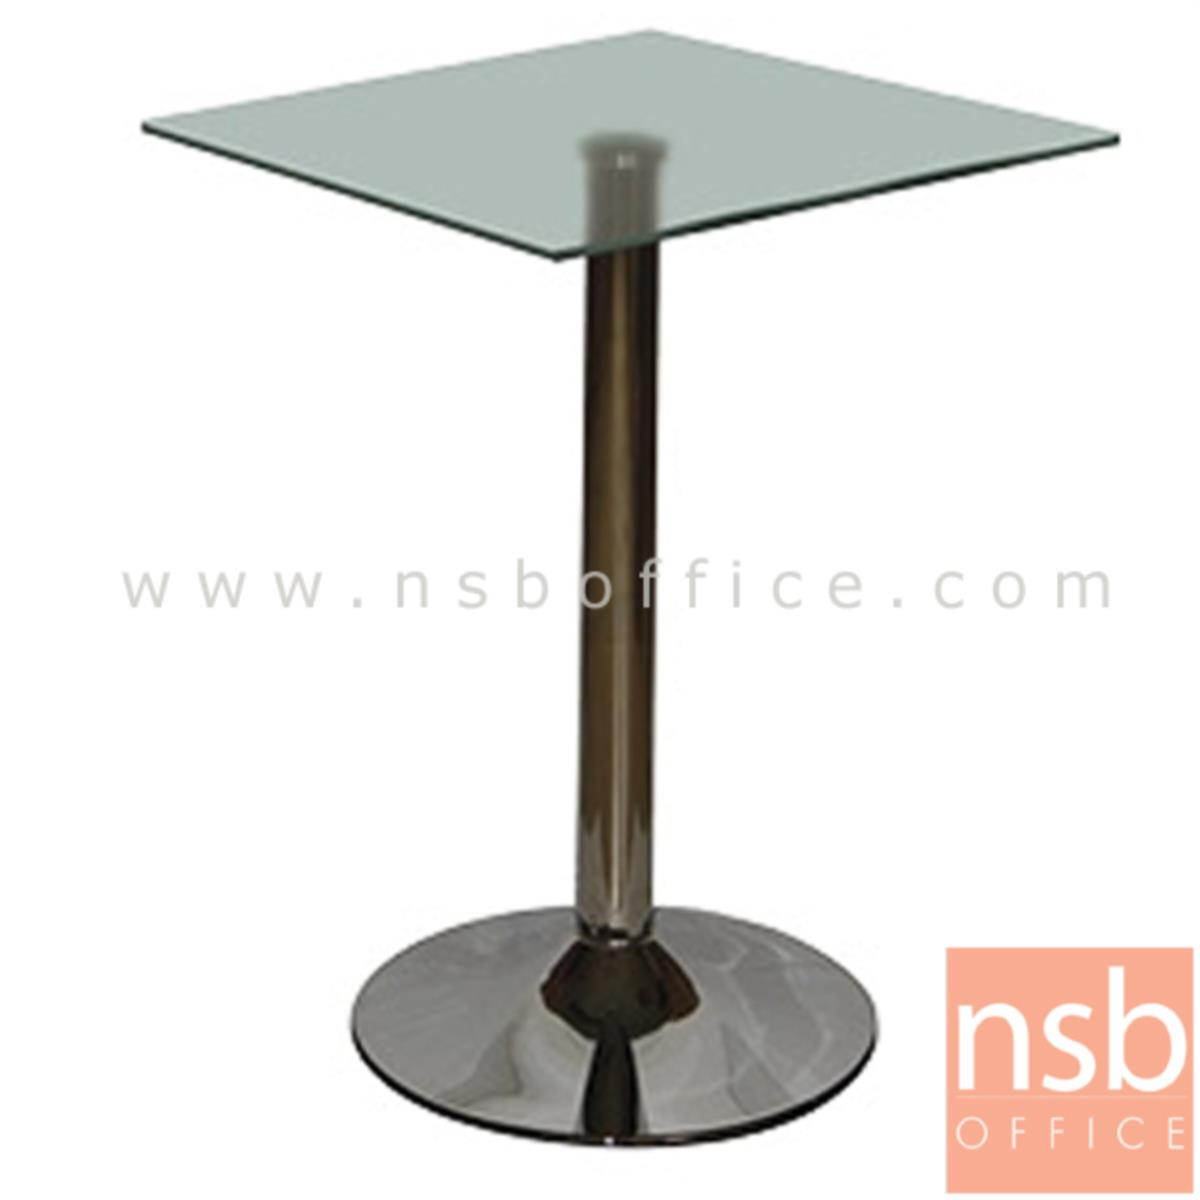 A09A084:โต๊ะเหลี่ยมหน้ากระจก รุ่น LOVE (เลิฟ) ขนาด 60W cm.  ขาเหล็กชุบโครเมี่ยม